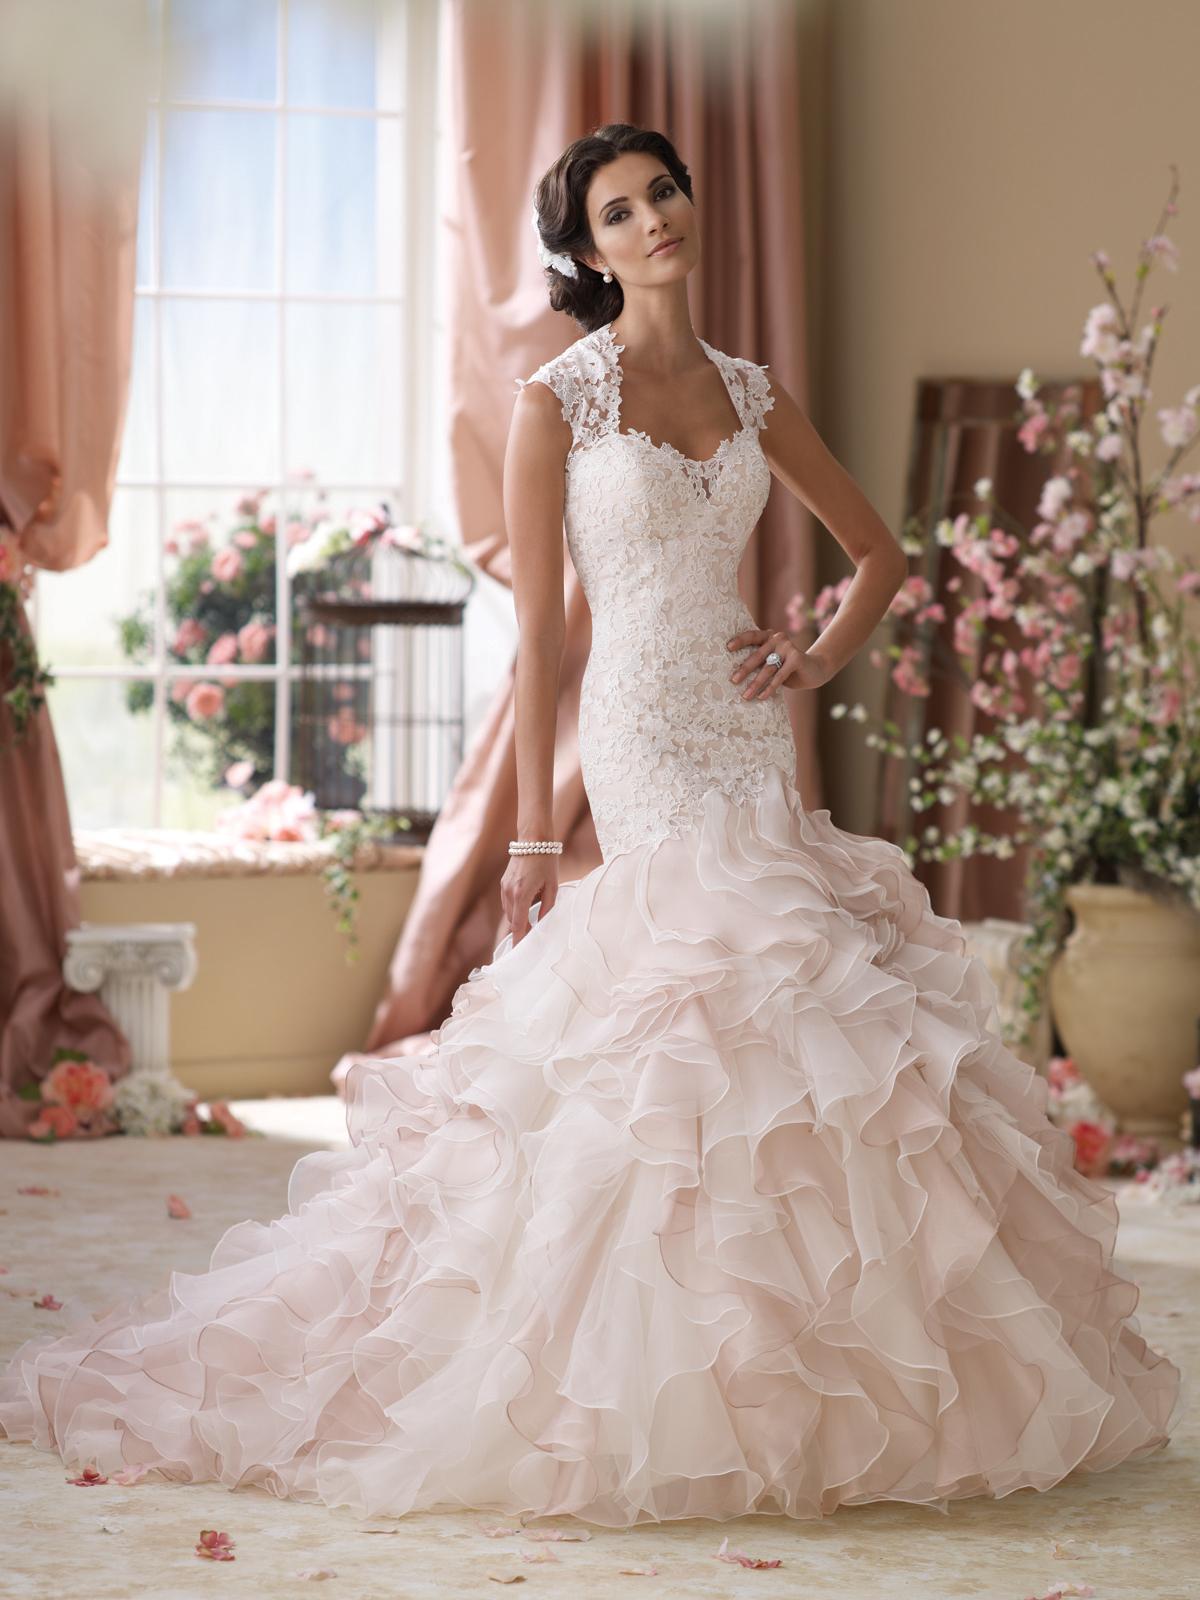 David Tutera Mon Cheri Gown #114276 Crowley · The Wedding Loft ...